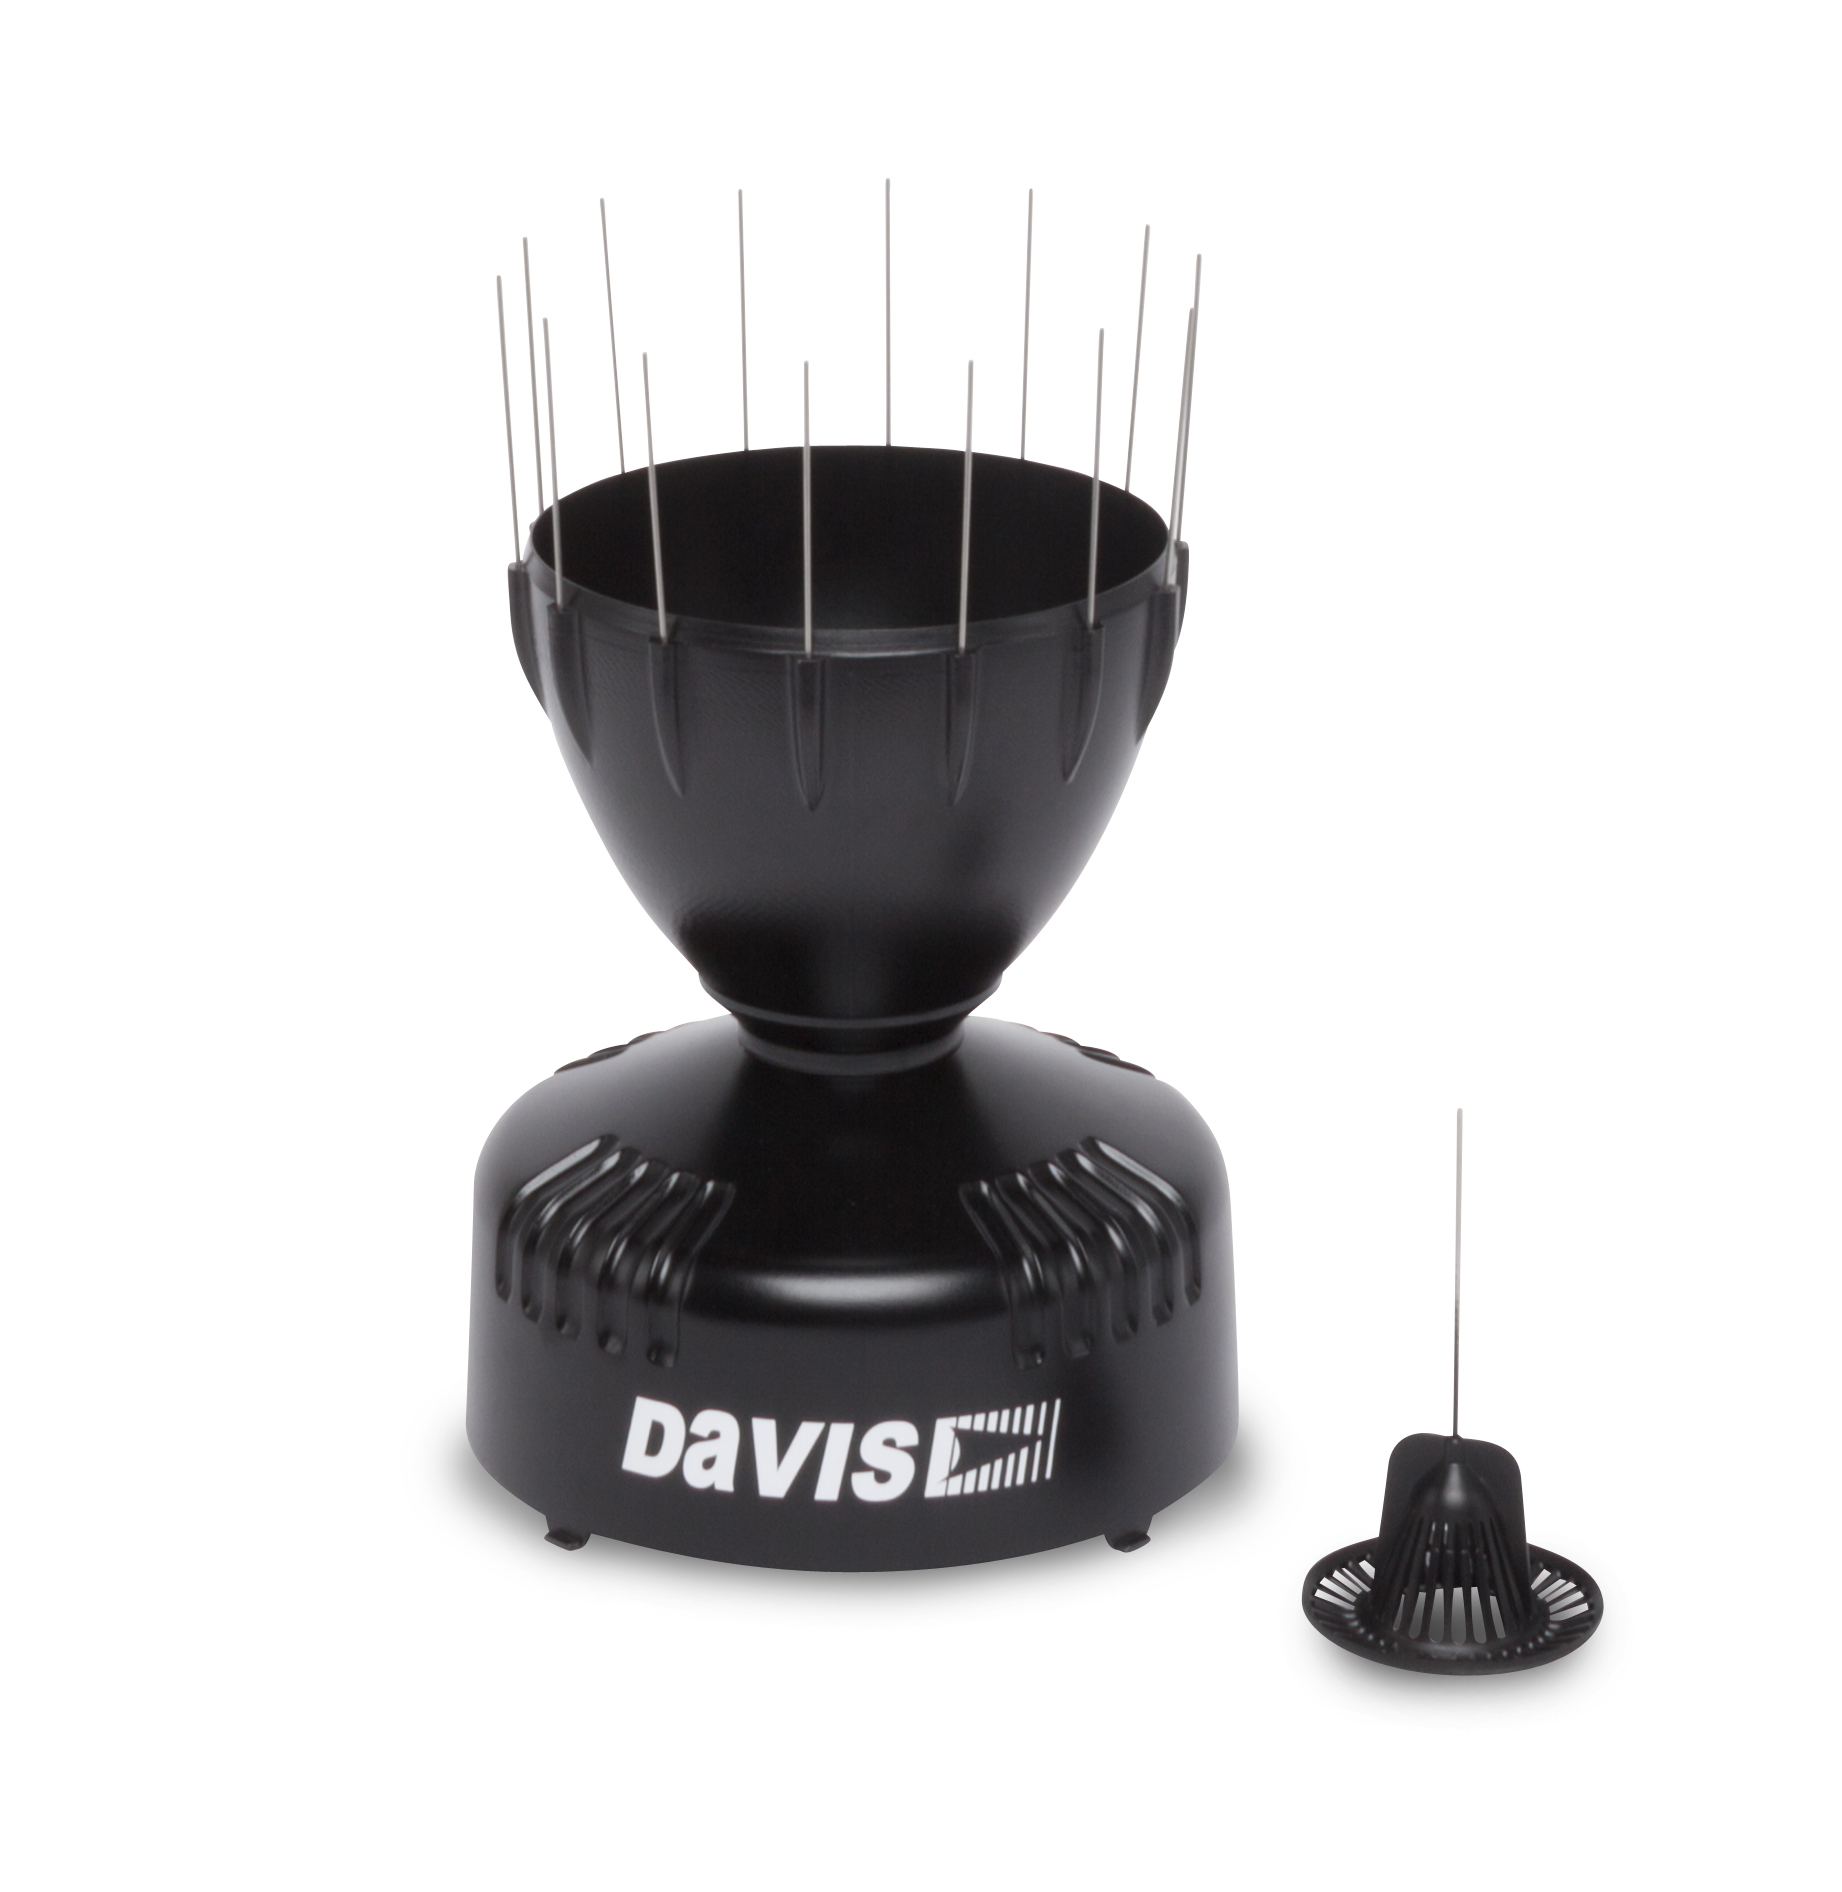 Davis 6152 VP2 Vantage Pro 2 professional weerstation